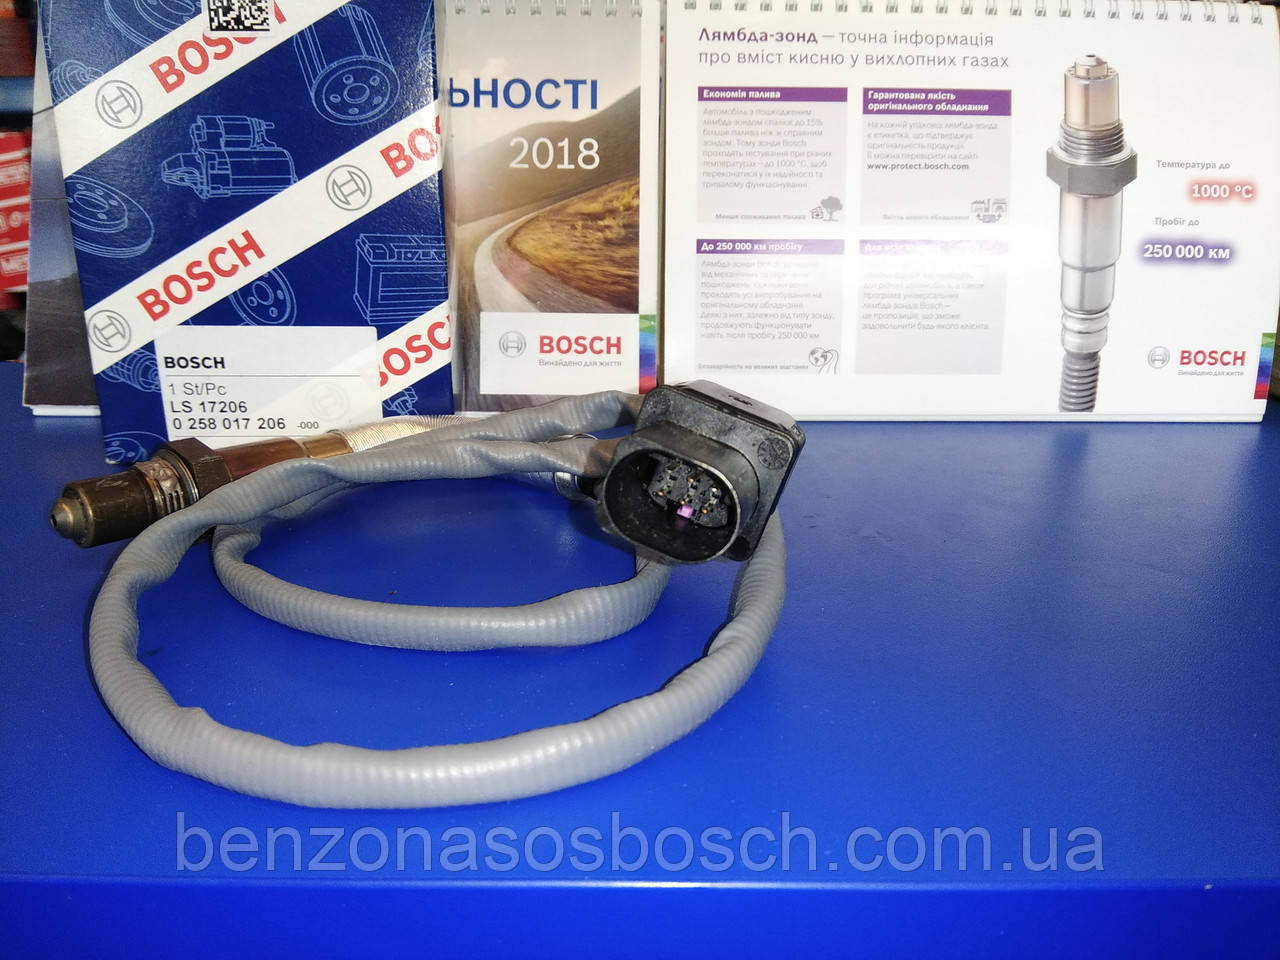 Лямбда-зонд Bosch 0258017206, 0 258 017 206, лямбда-зонд BMW